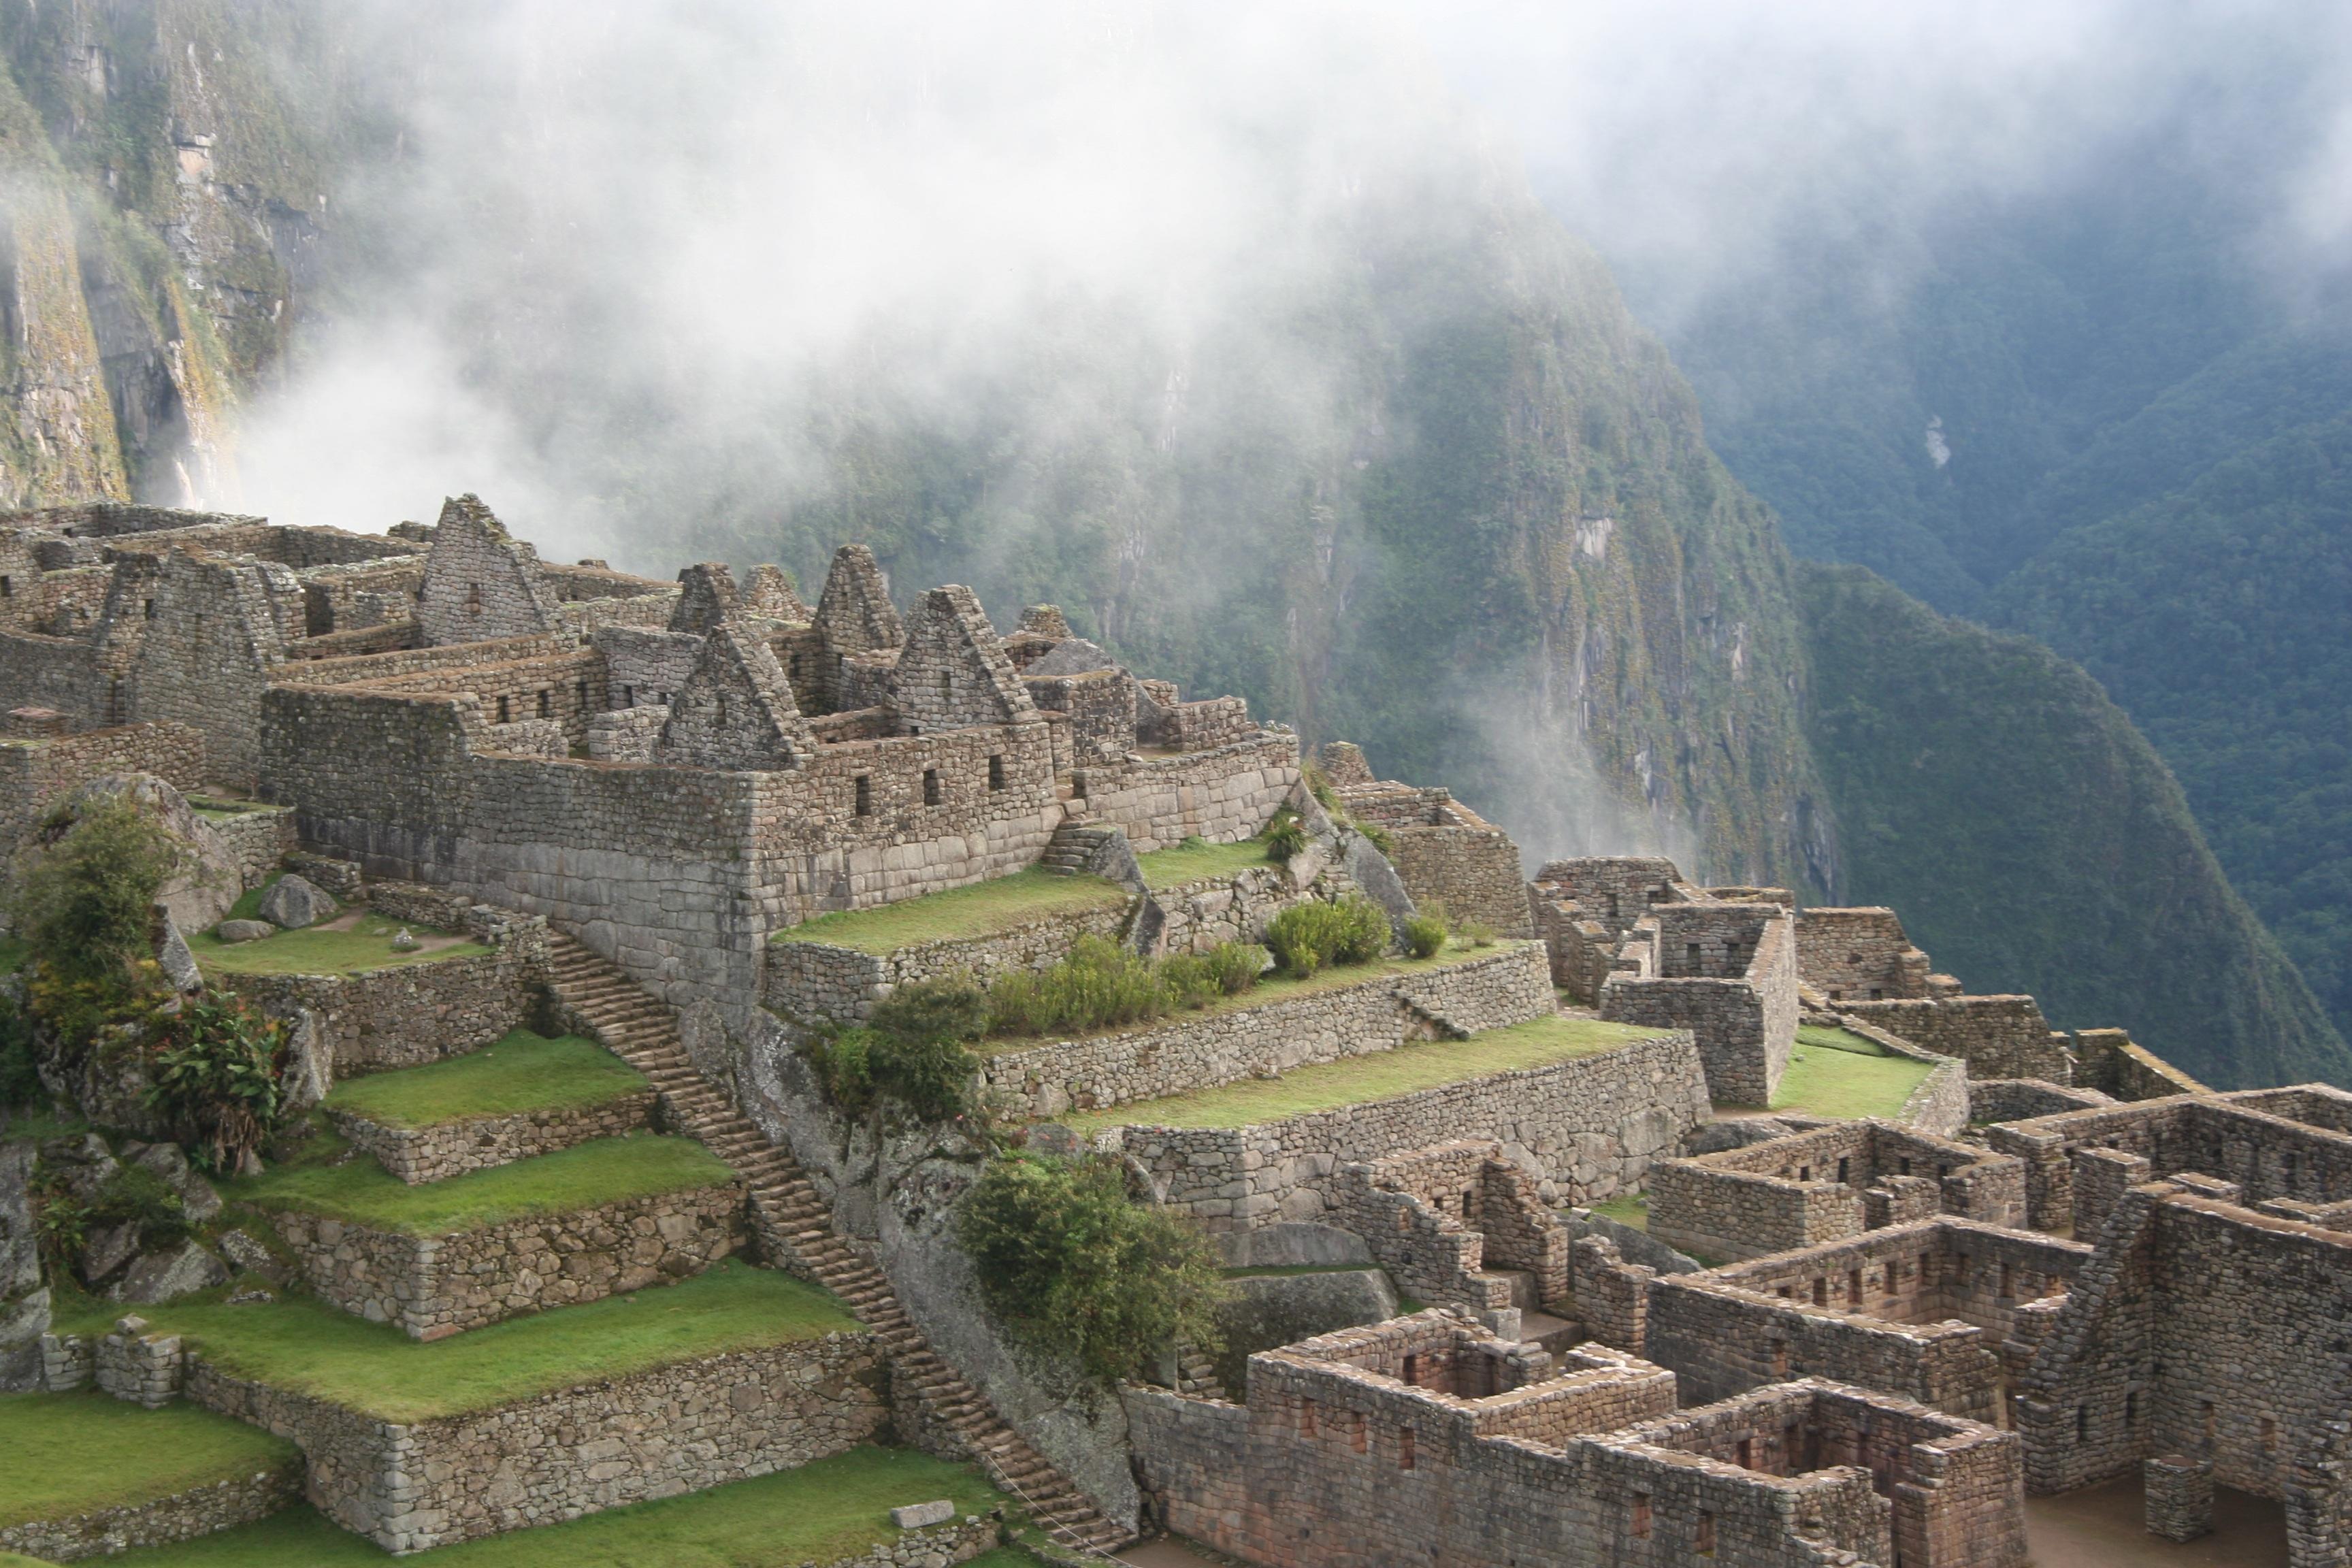 peruvian city inca empire - HD3456×2304